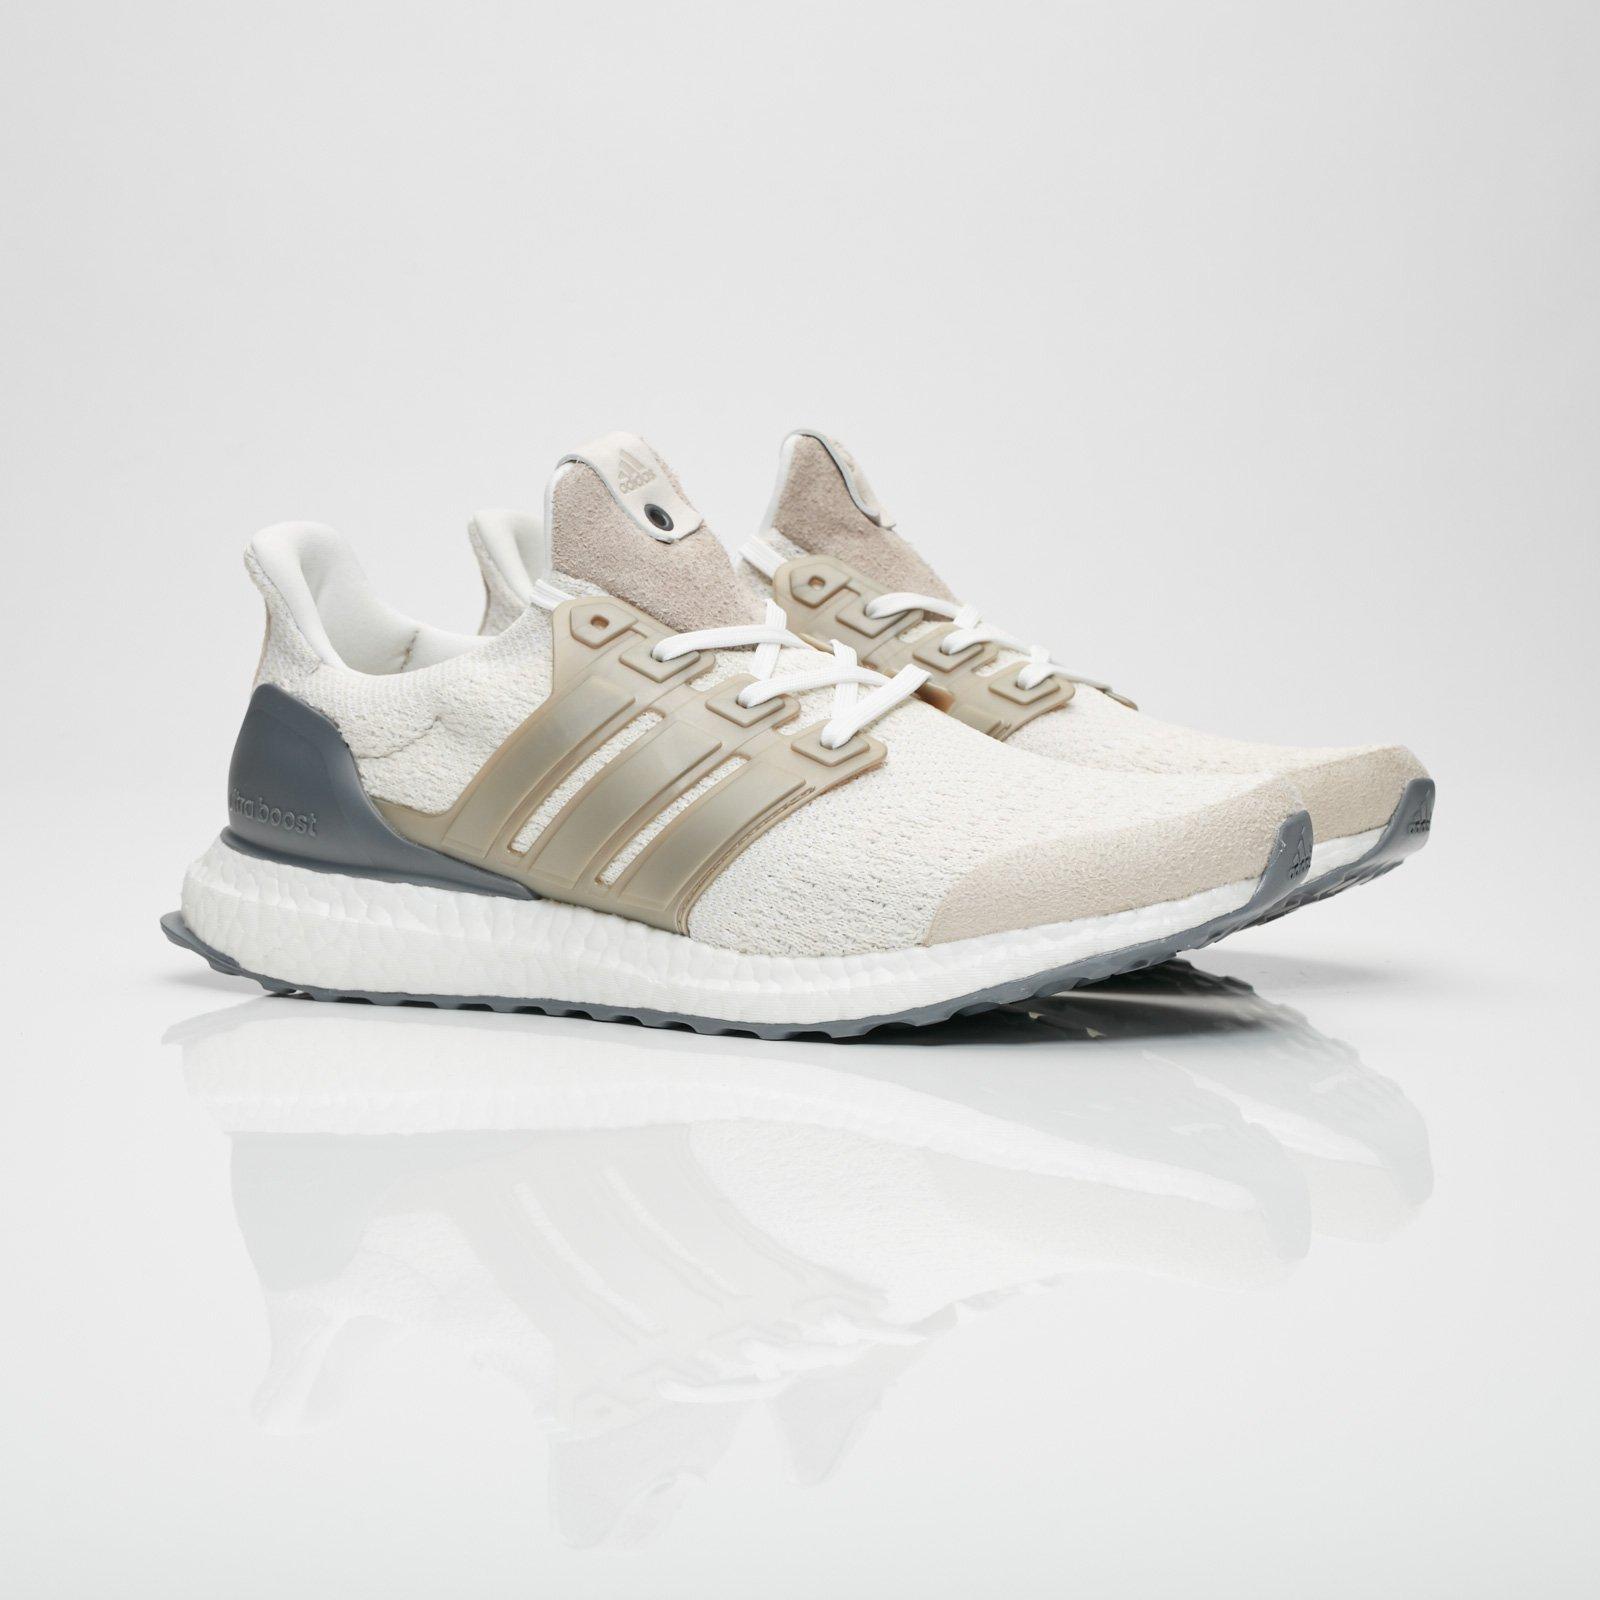 01801142959a5 adidas UltraBOOST Lux - Db0338 - Sneakersnstuff